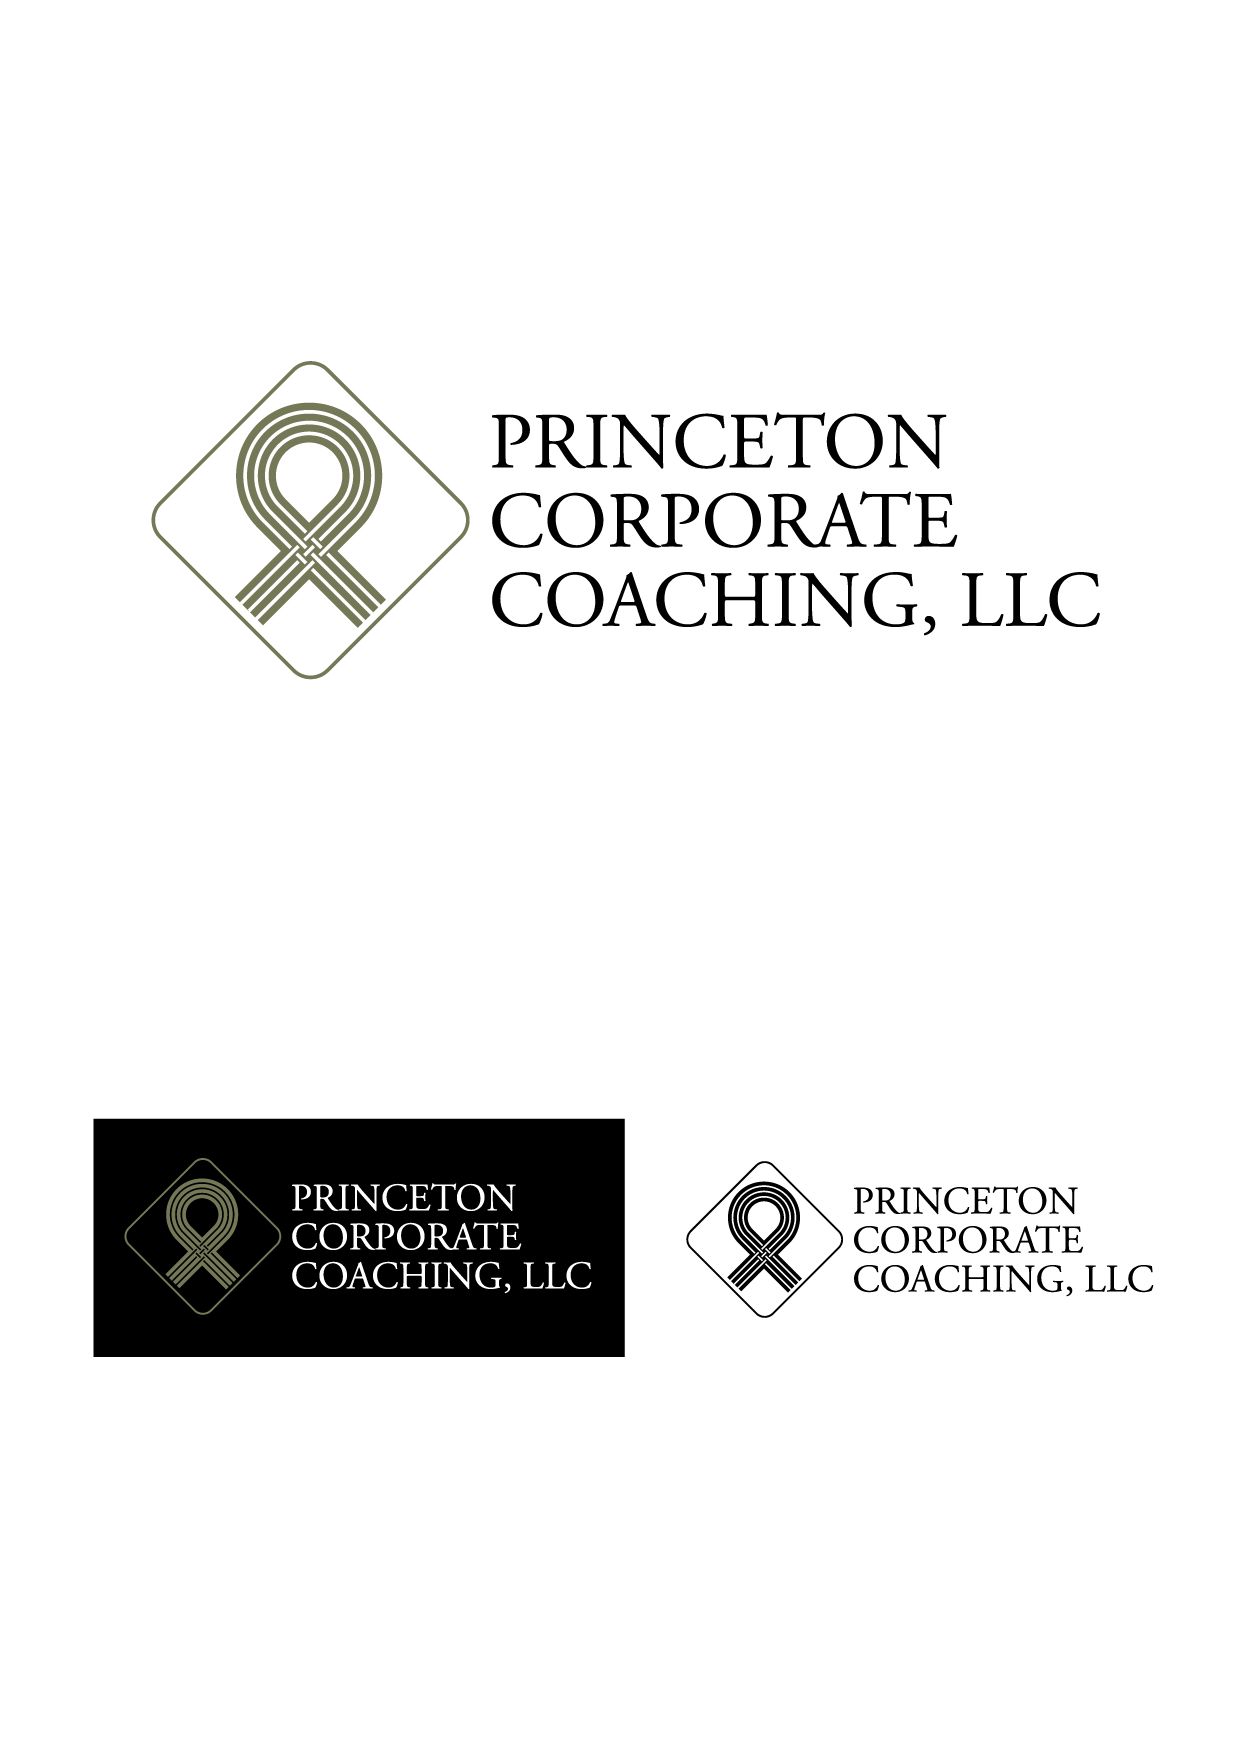 Logo Design by Wilfredo Mendoza - Entry No. 39 in the Logo Design Contest Unique Logo Design Wanted for Princeton Corporate Coaching, LLC.